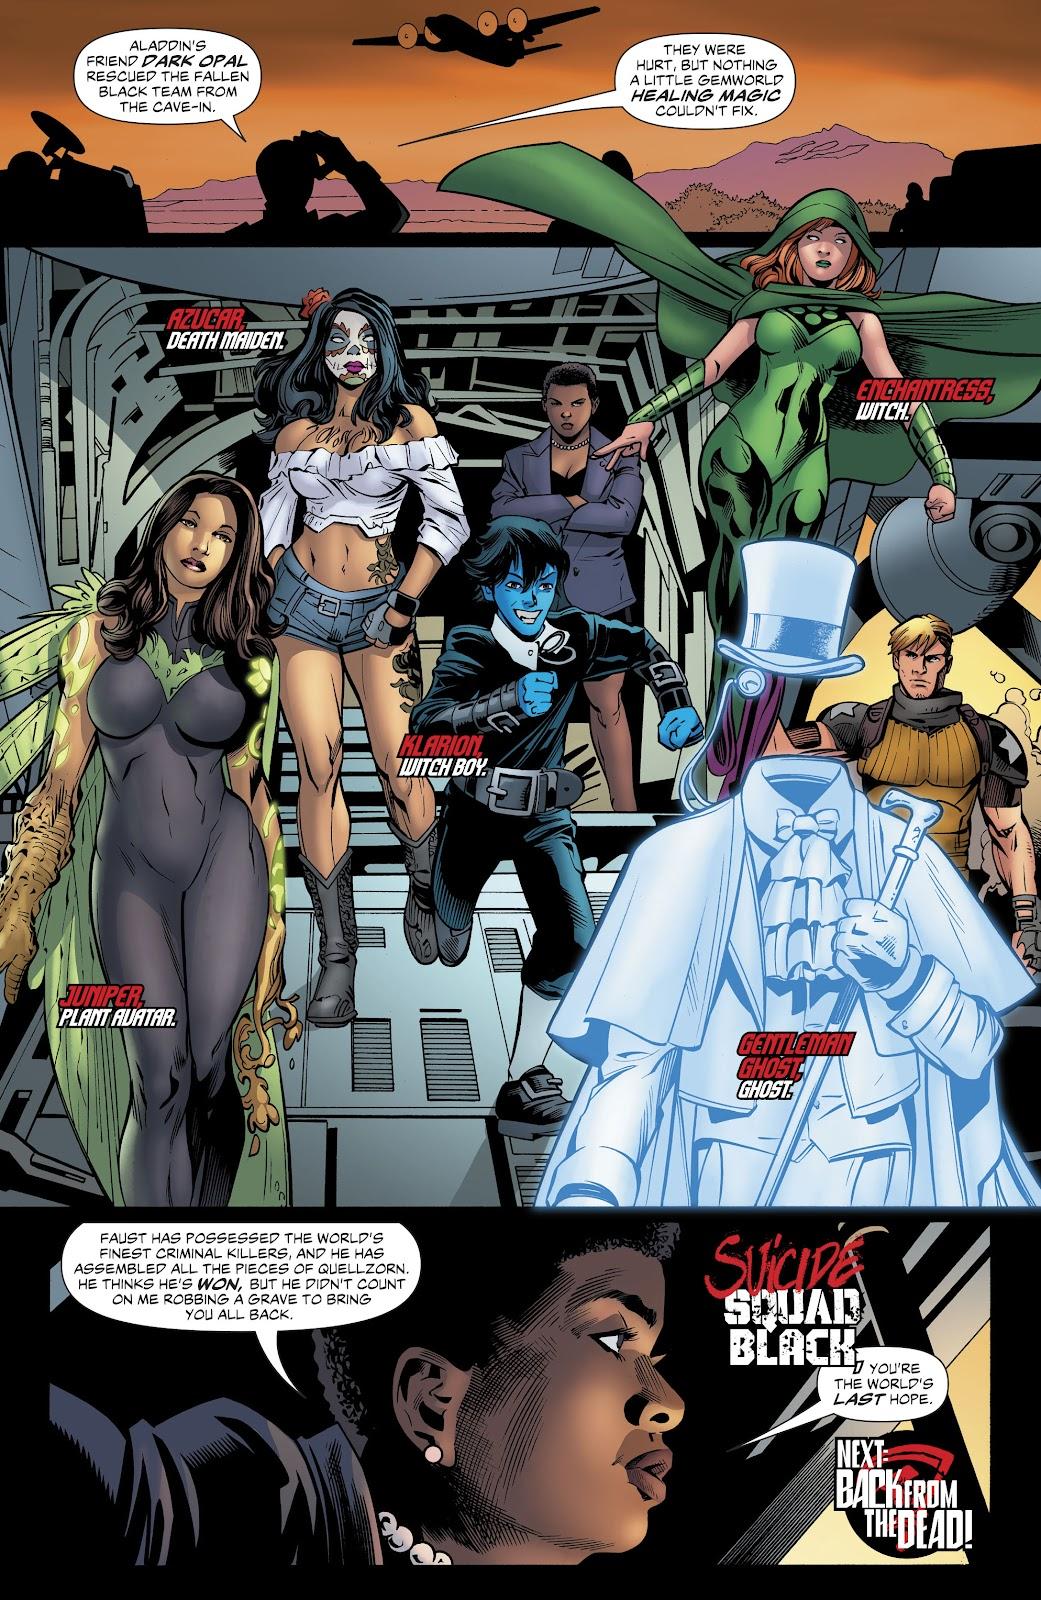 Read online Suicide Squad Black Files comic -  Issue #4 - 41